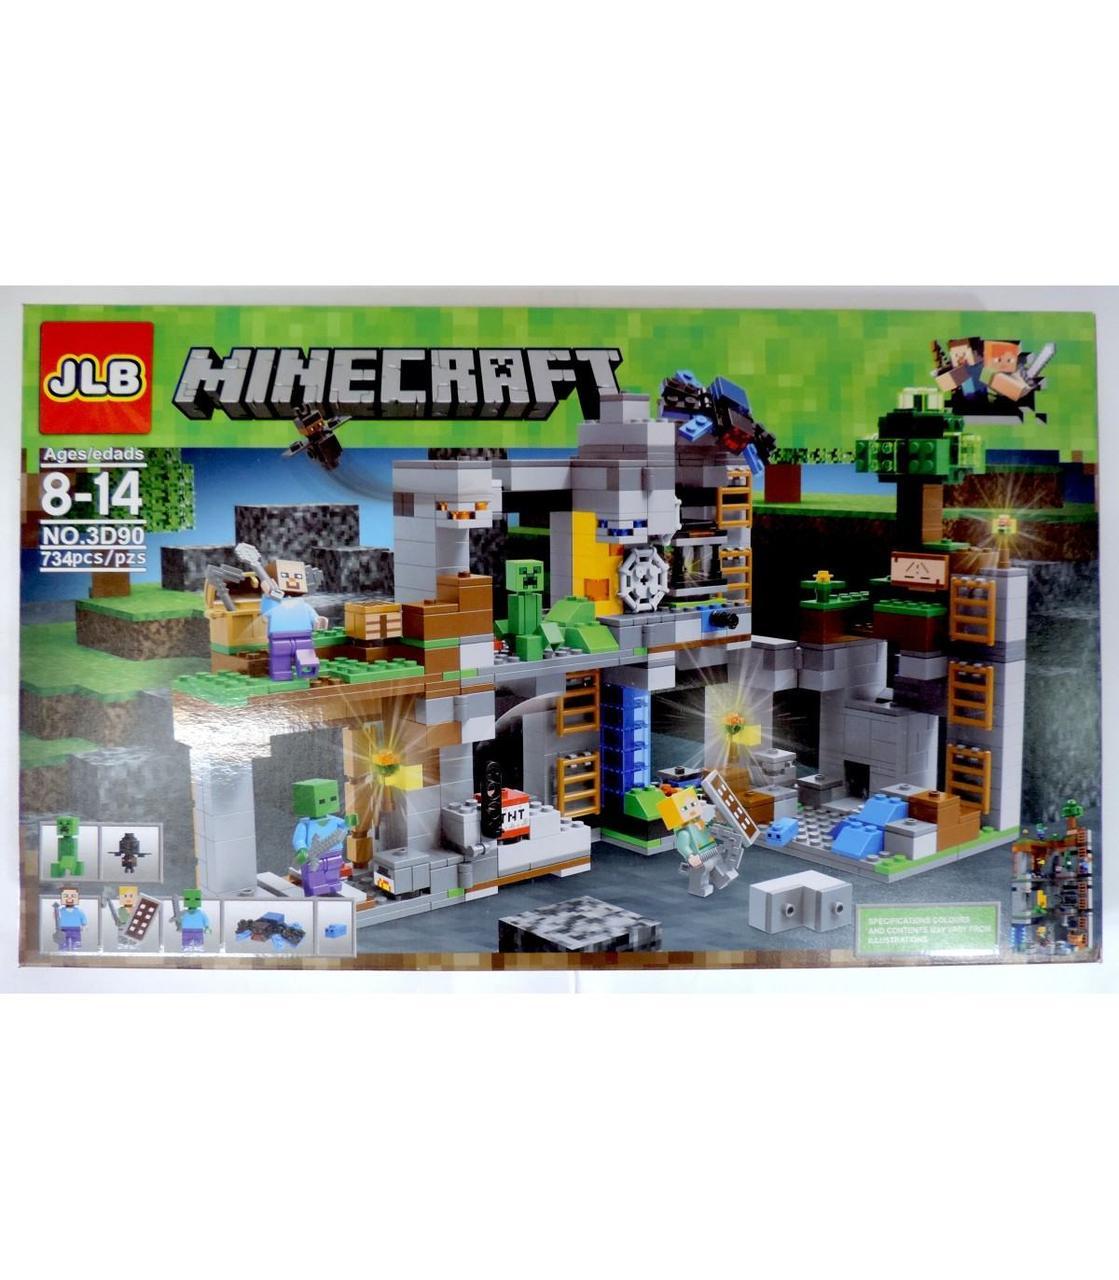 Великий конструктор Майнкрафт JLB Minecraft Набір 734 pcs GA7-20